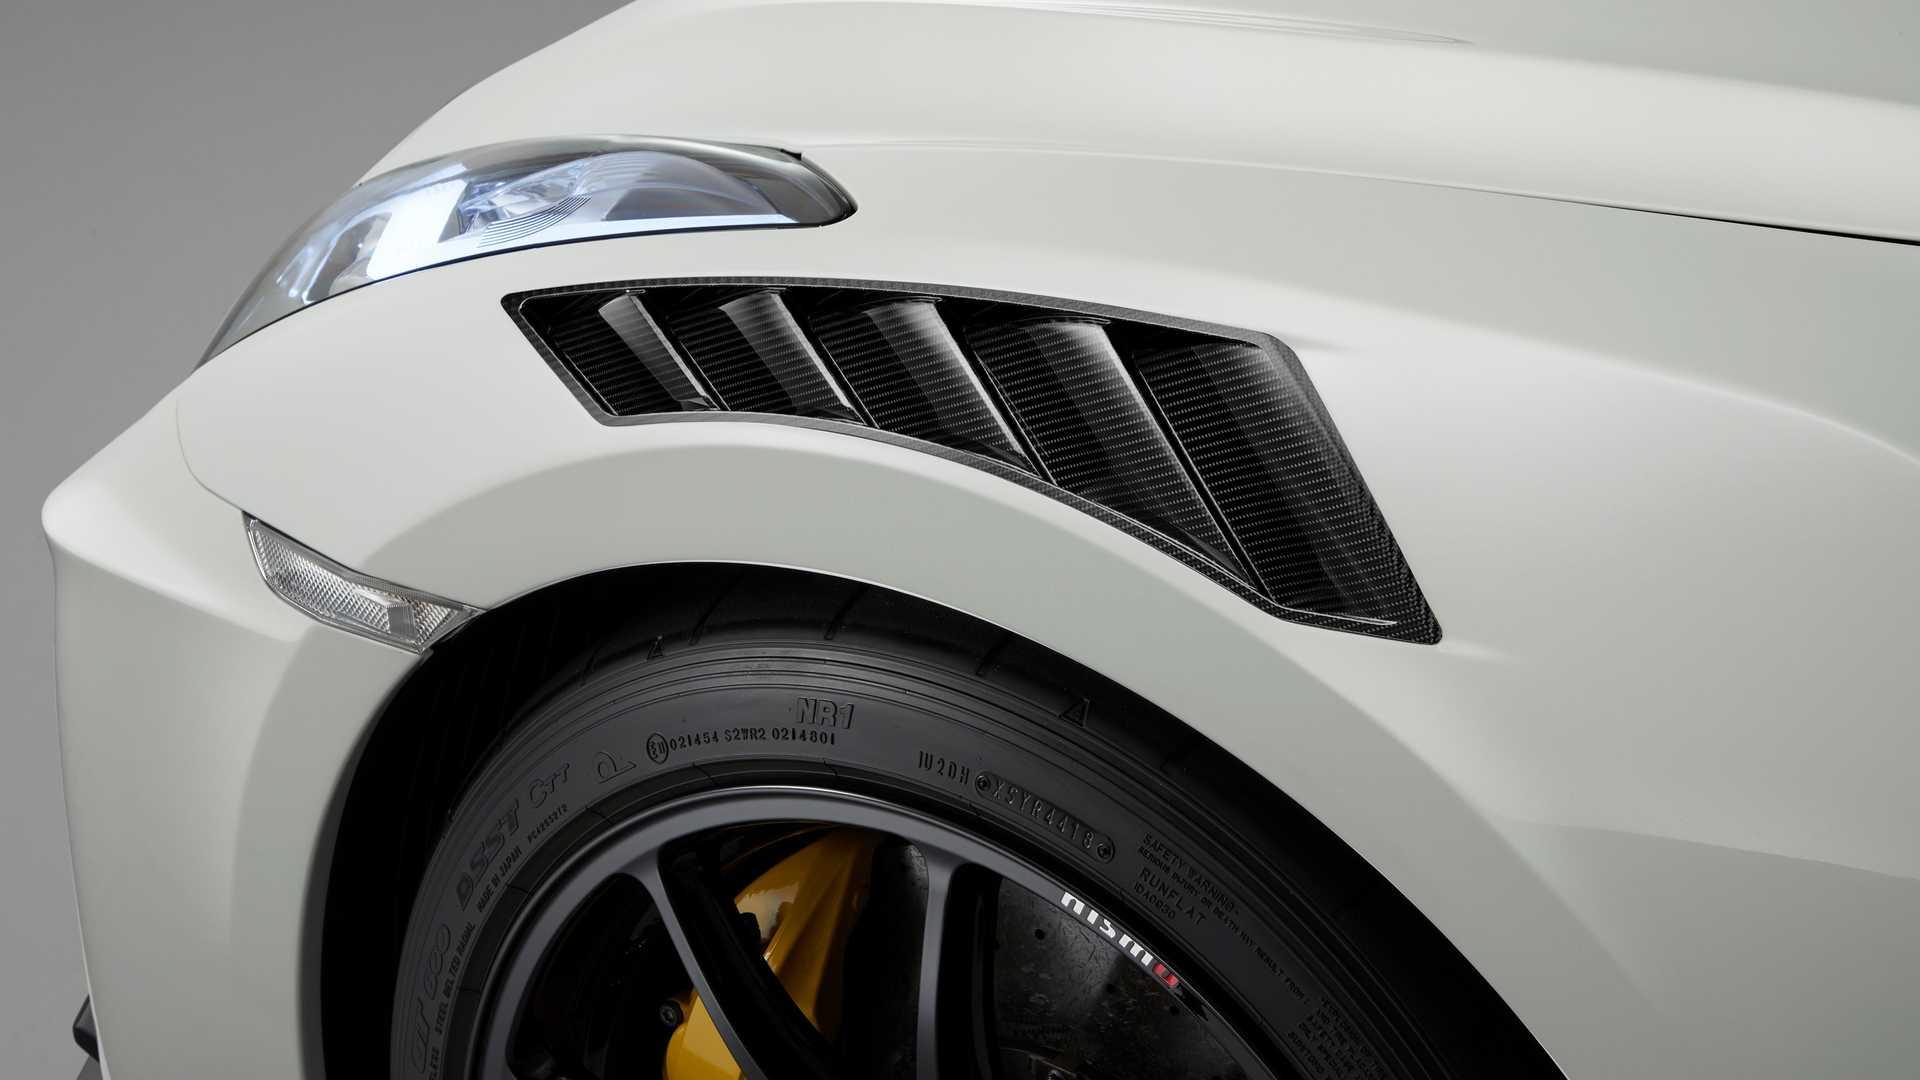 2020 Nissan GT-R NISMO Detail Wallpaper (13)